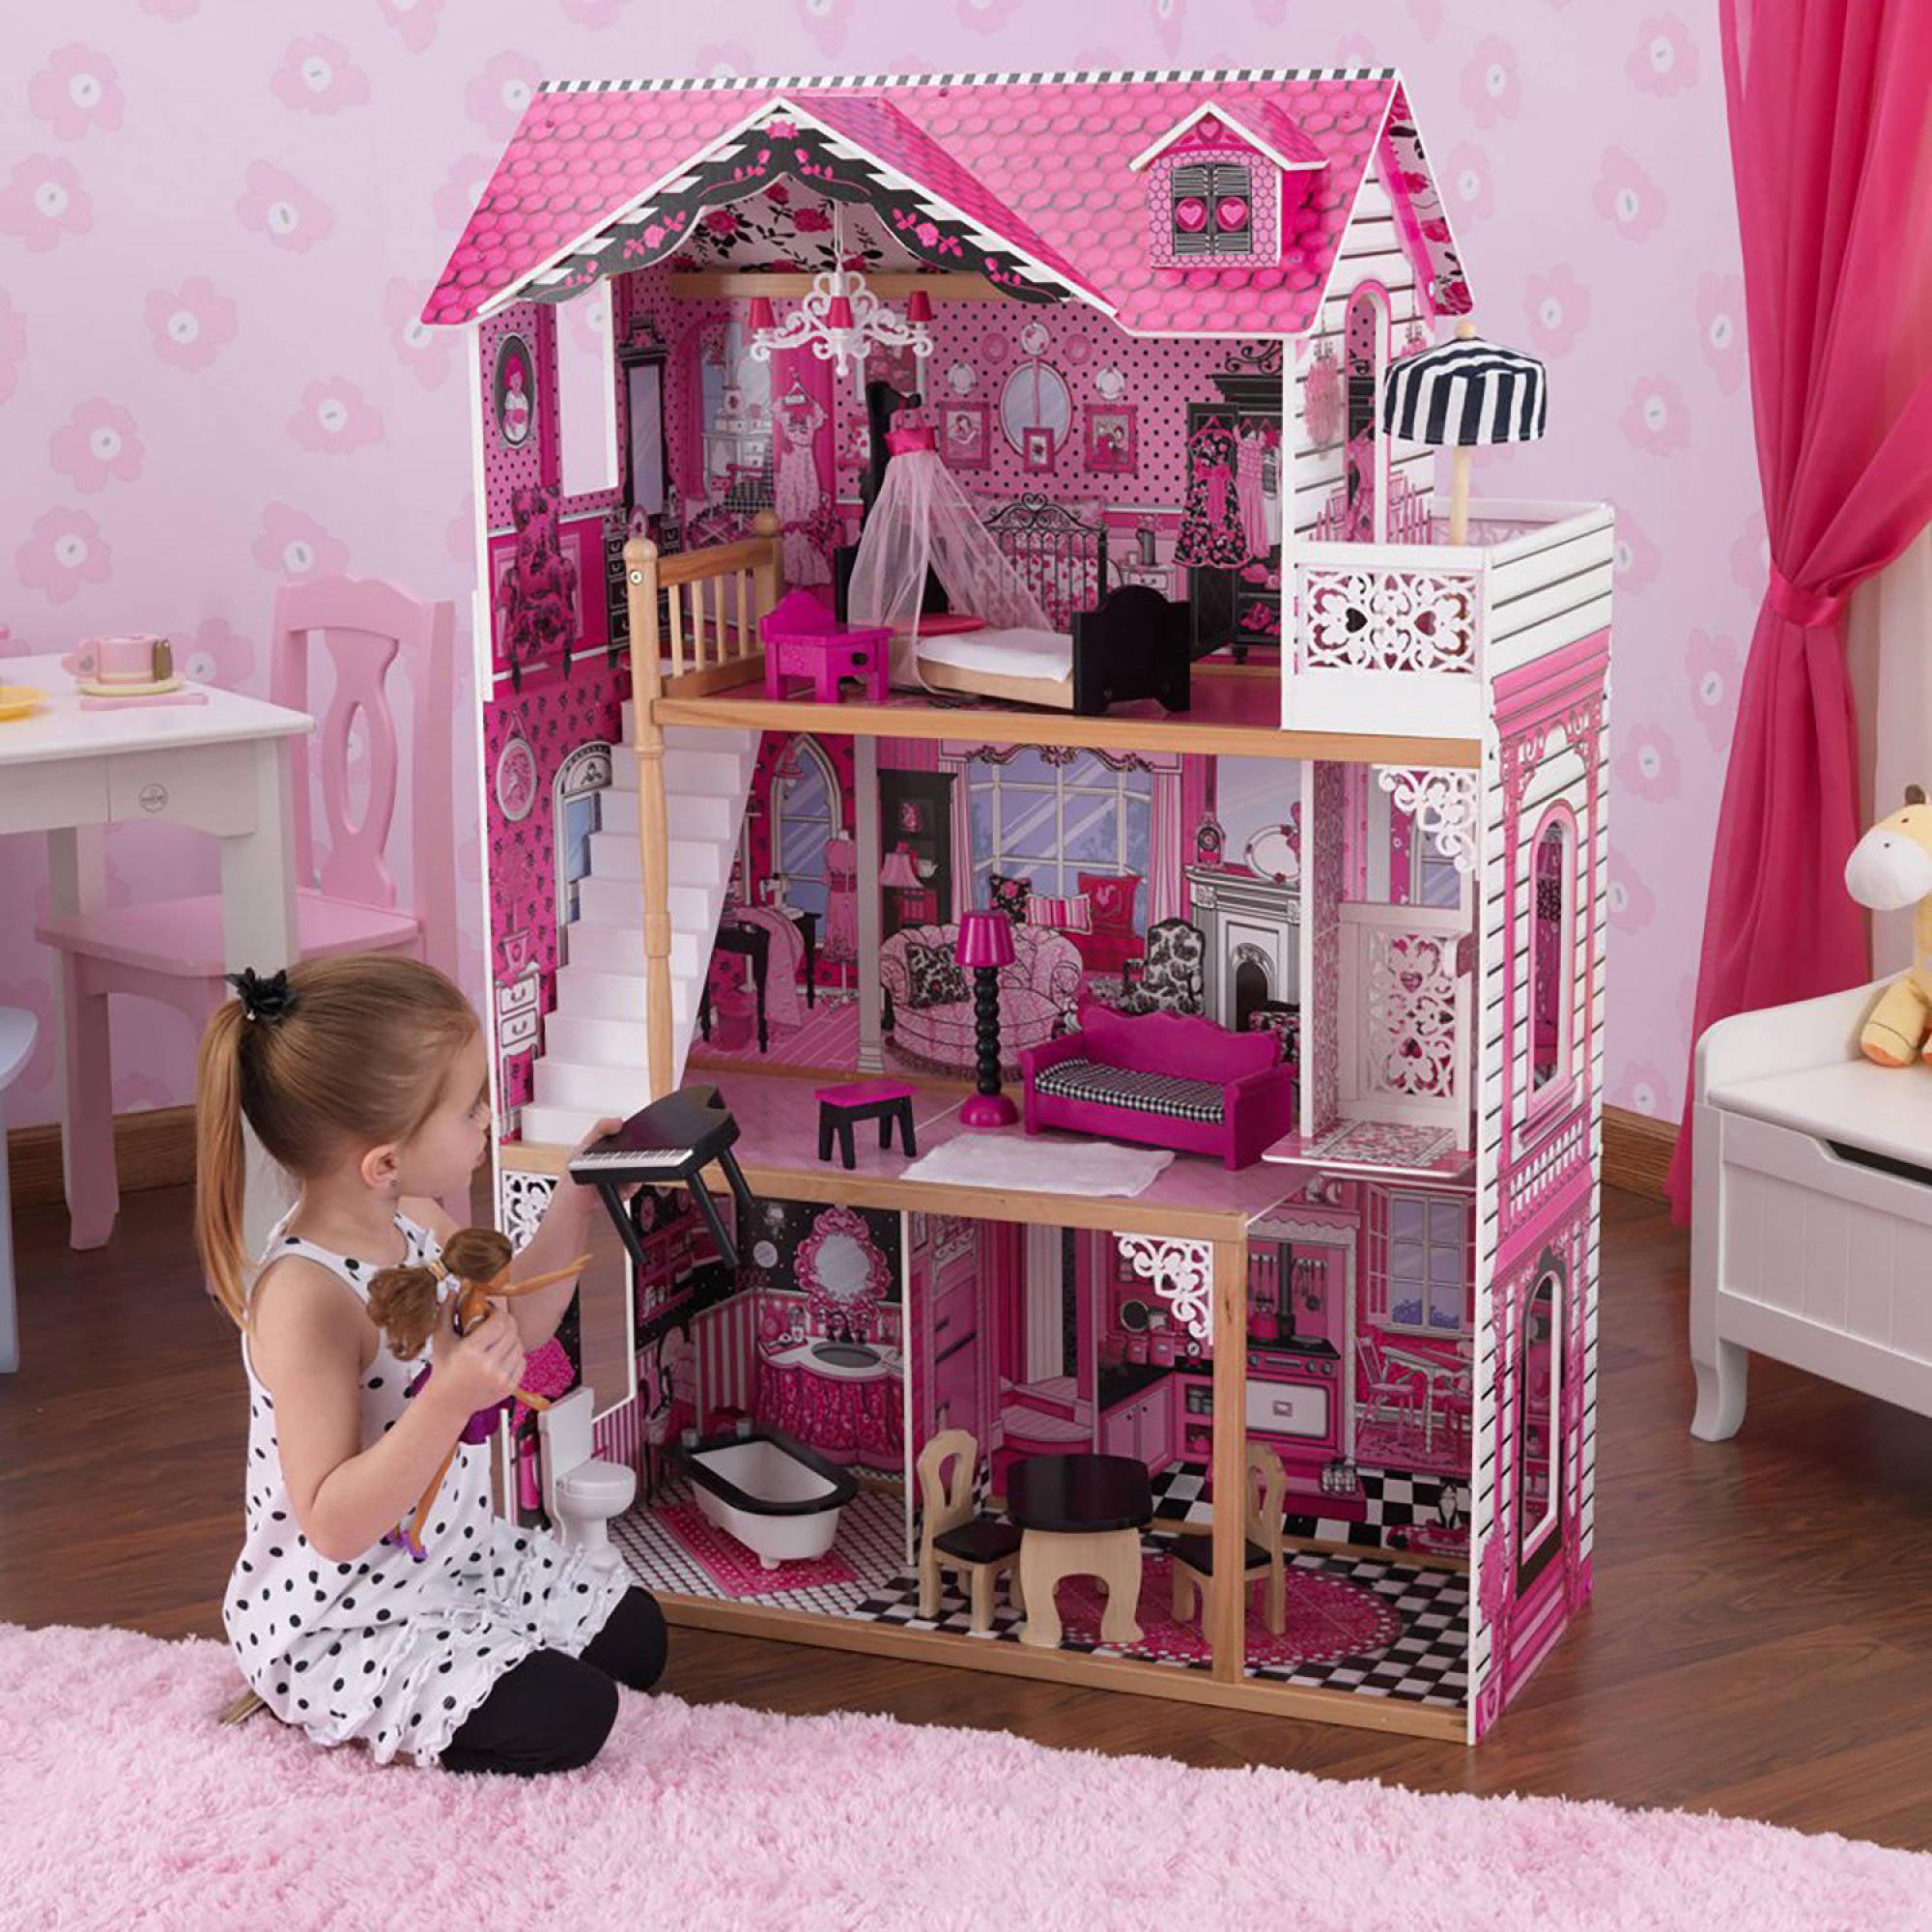 KidKraft Amelia Dollhouse 65093 by KidKraft